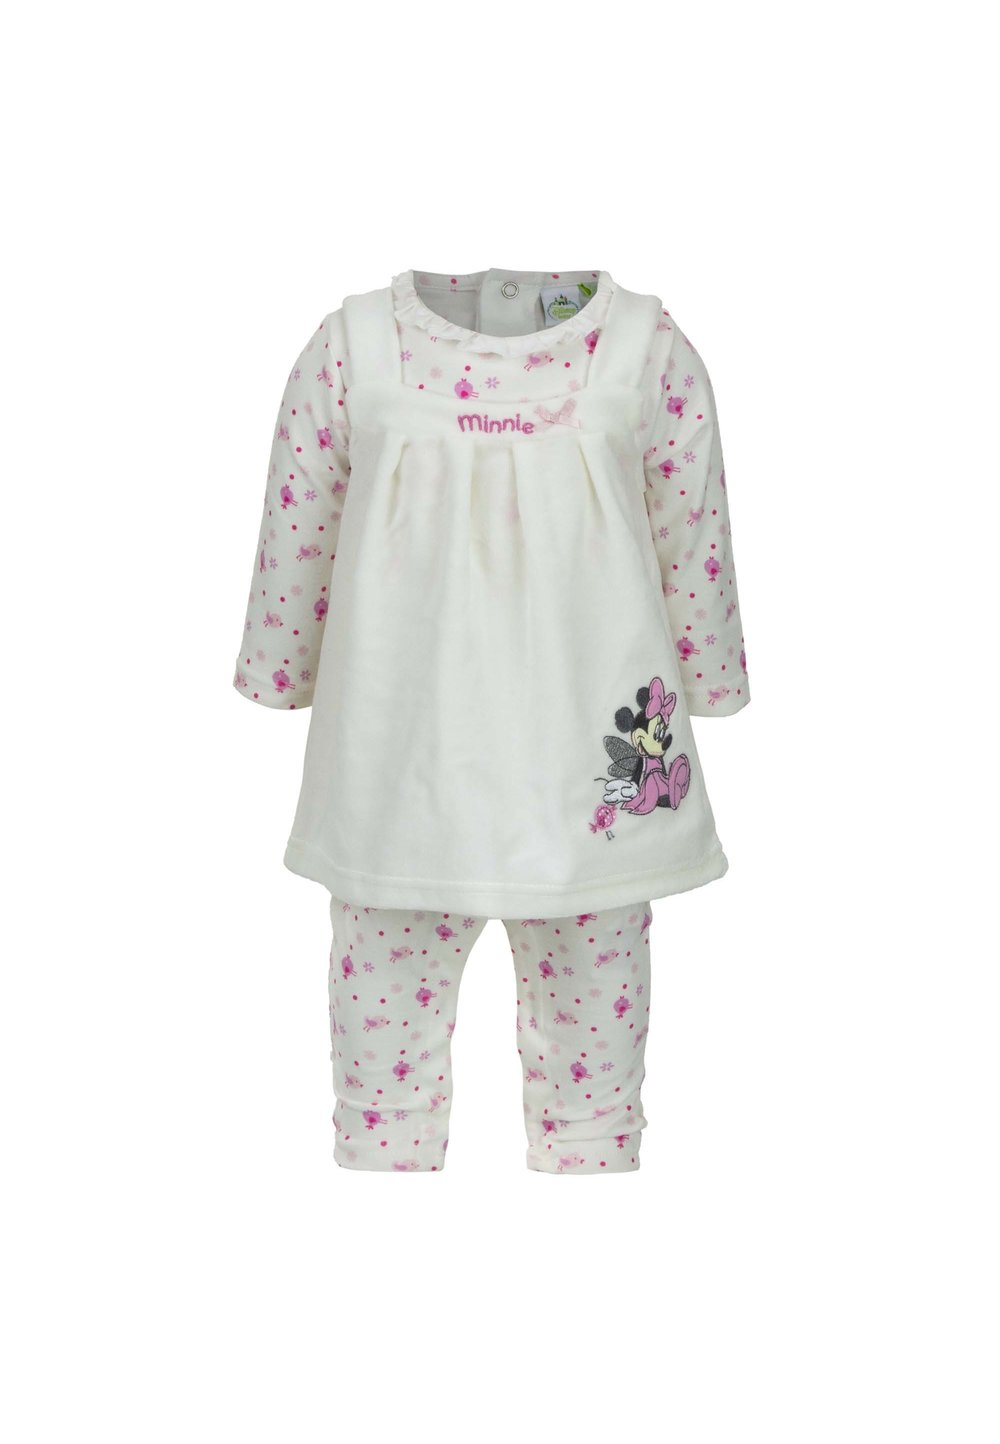 Set 2 piese, salopeta si rochita, Minnie, alb cu roz imagine